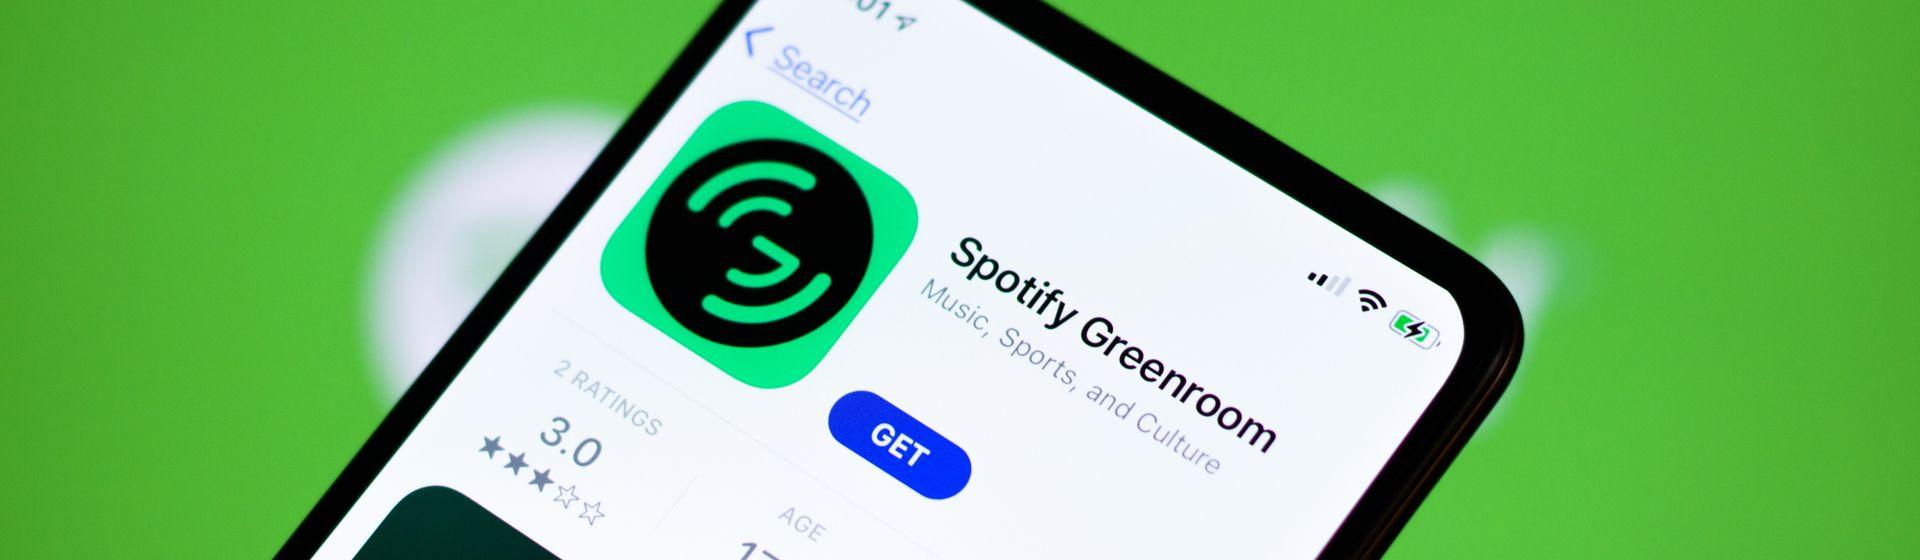 Spotify Greenroom: tudo sobre o rival do Clubhouse